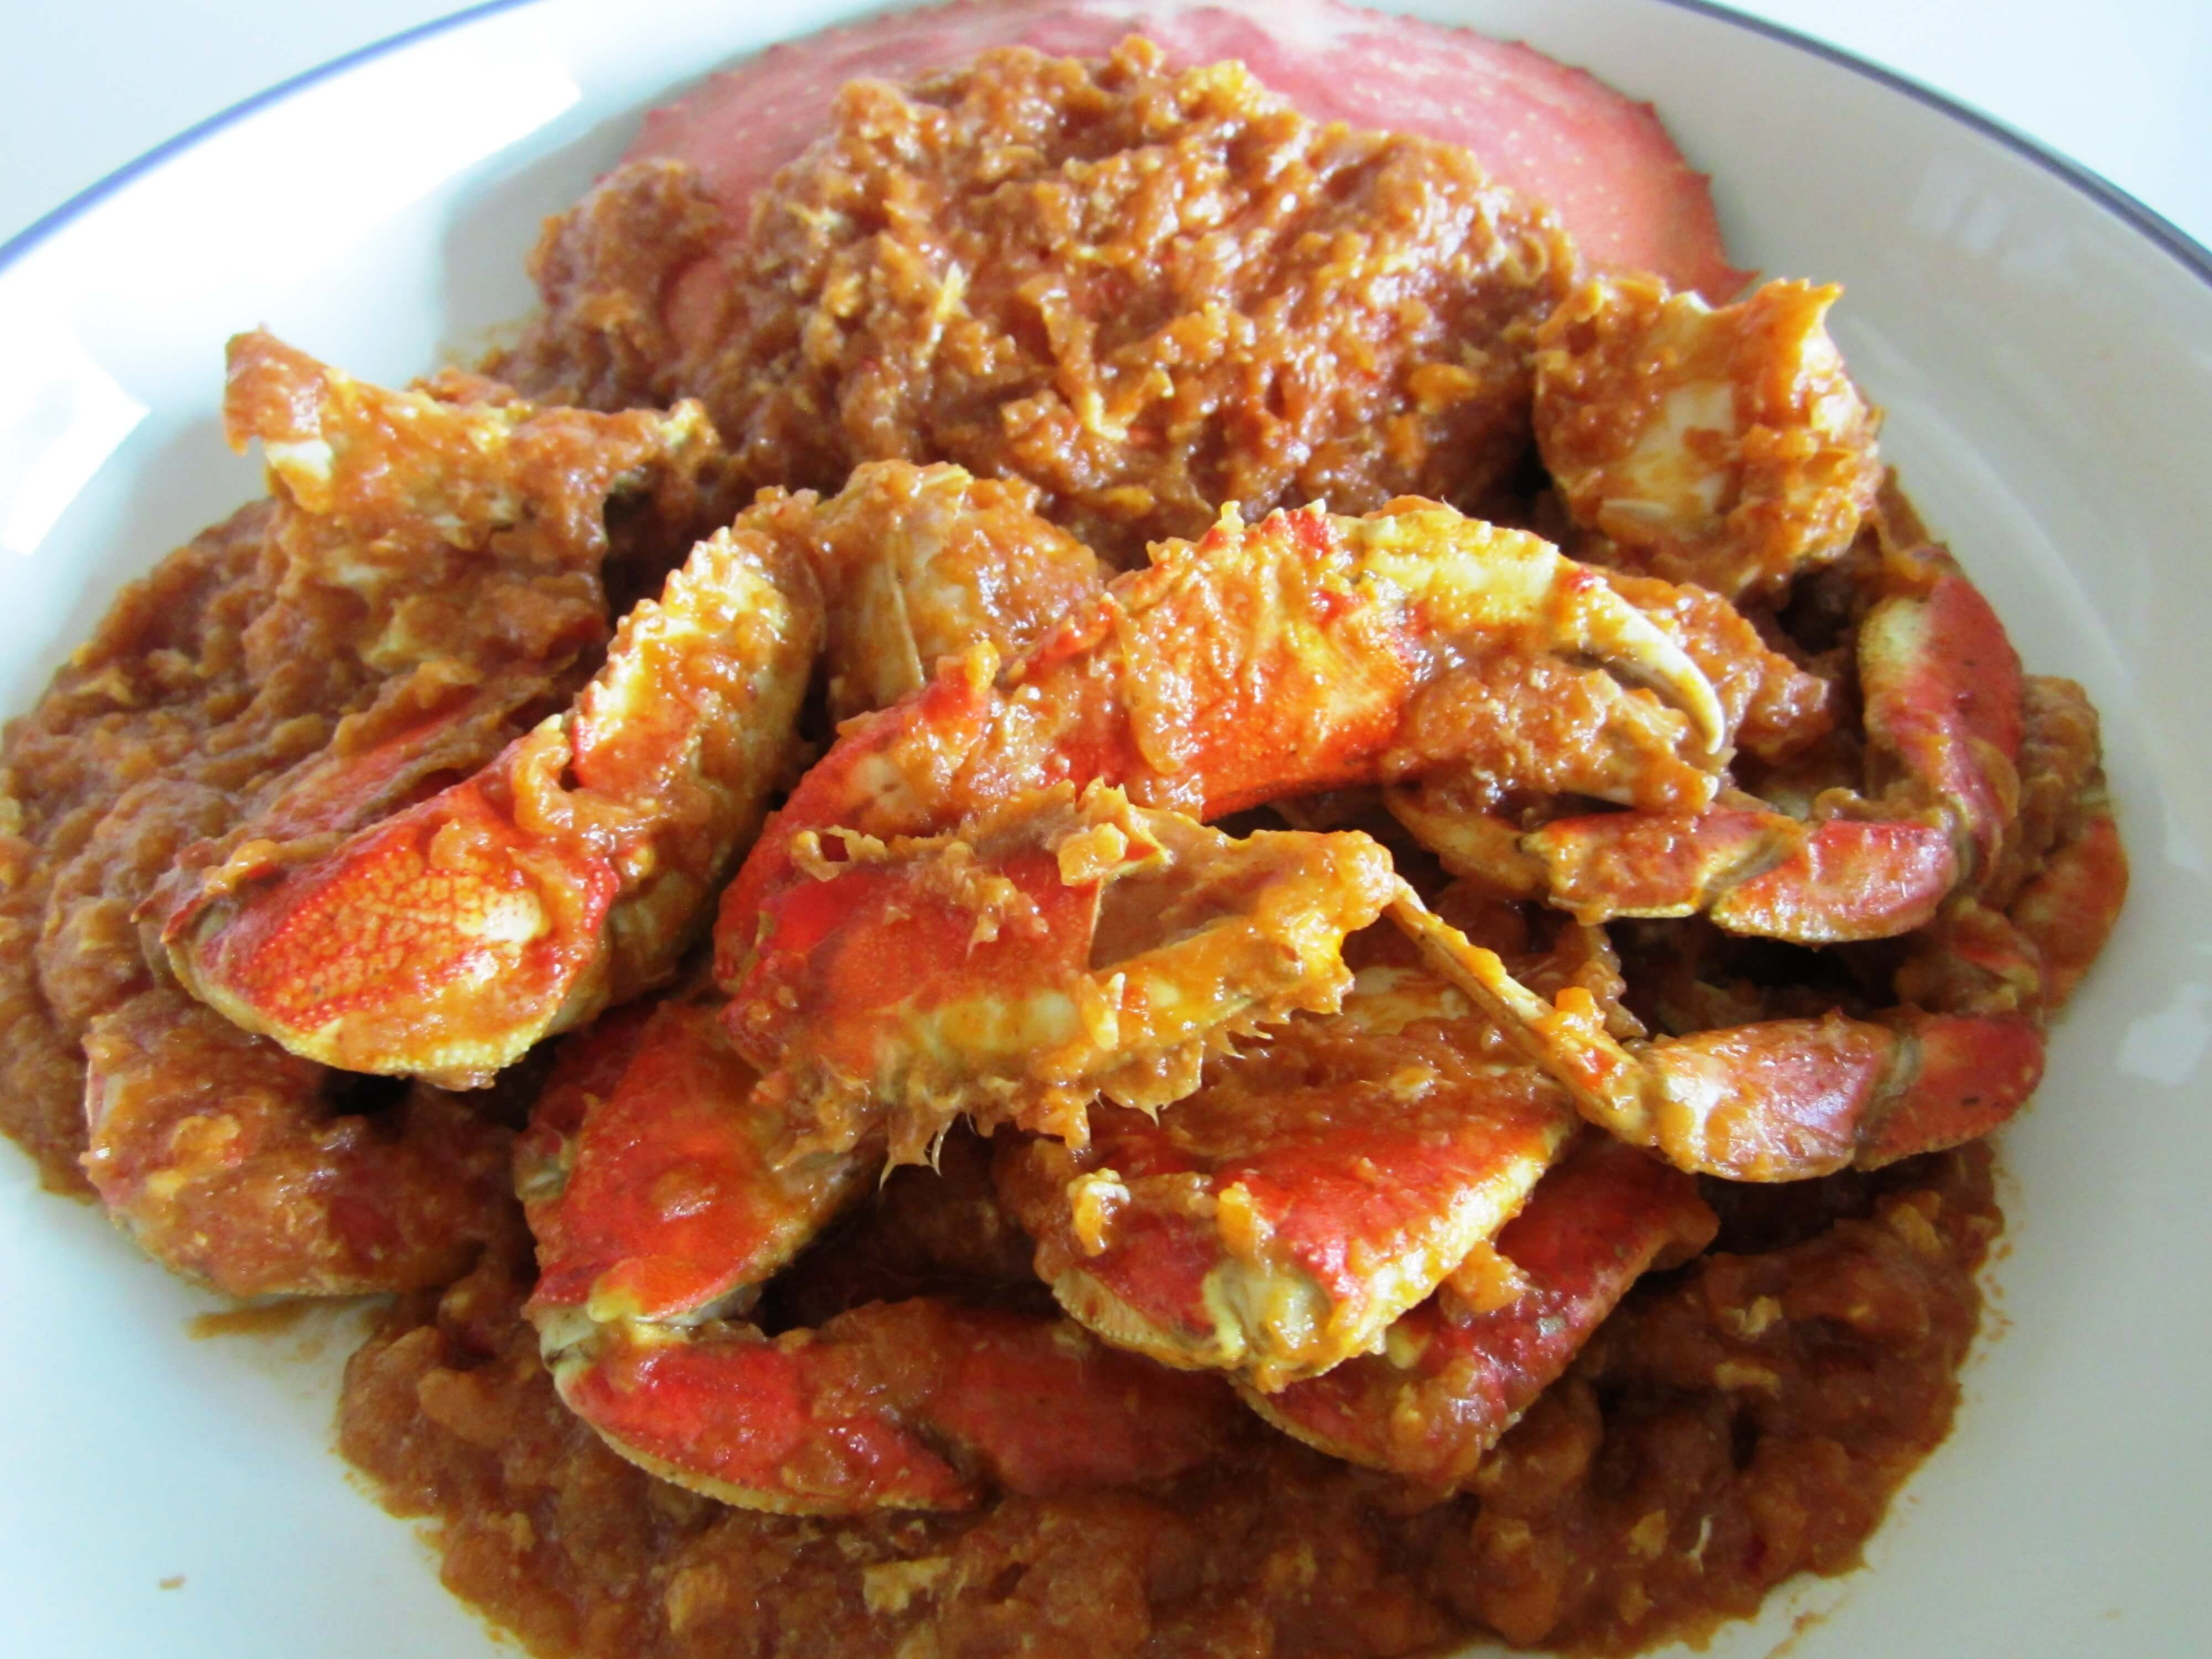 Chili Crab Hd